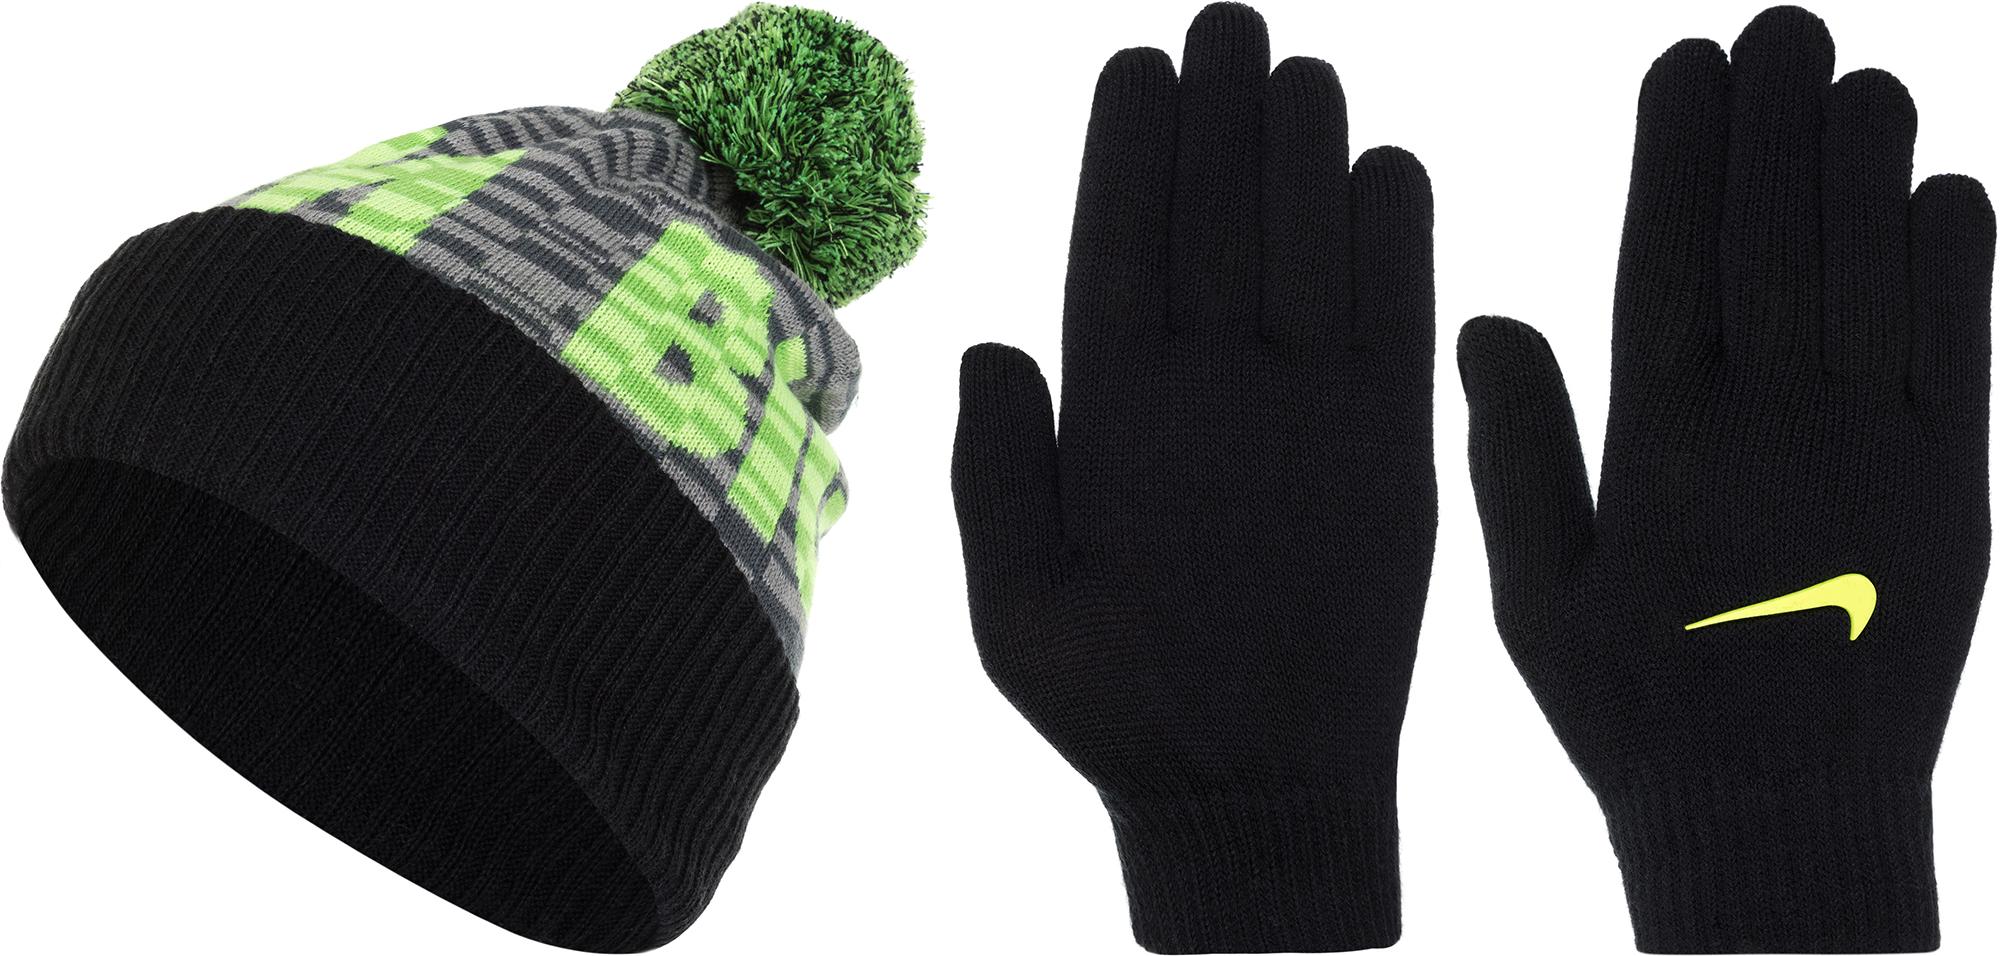 Nike Комплект для мальчиков: шапка и перчатки Nike, размер Без размера шапки и кепки для туризма и кемпинга nike 688510 2015 584169 010